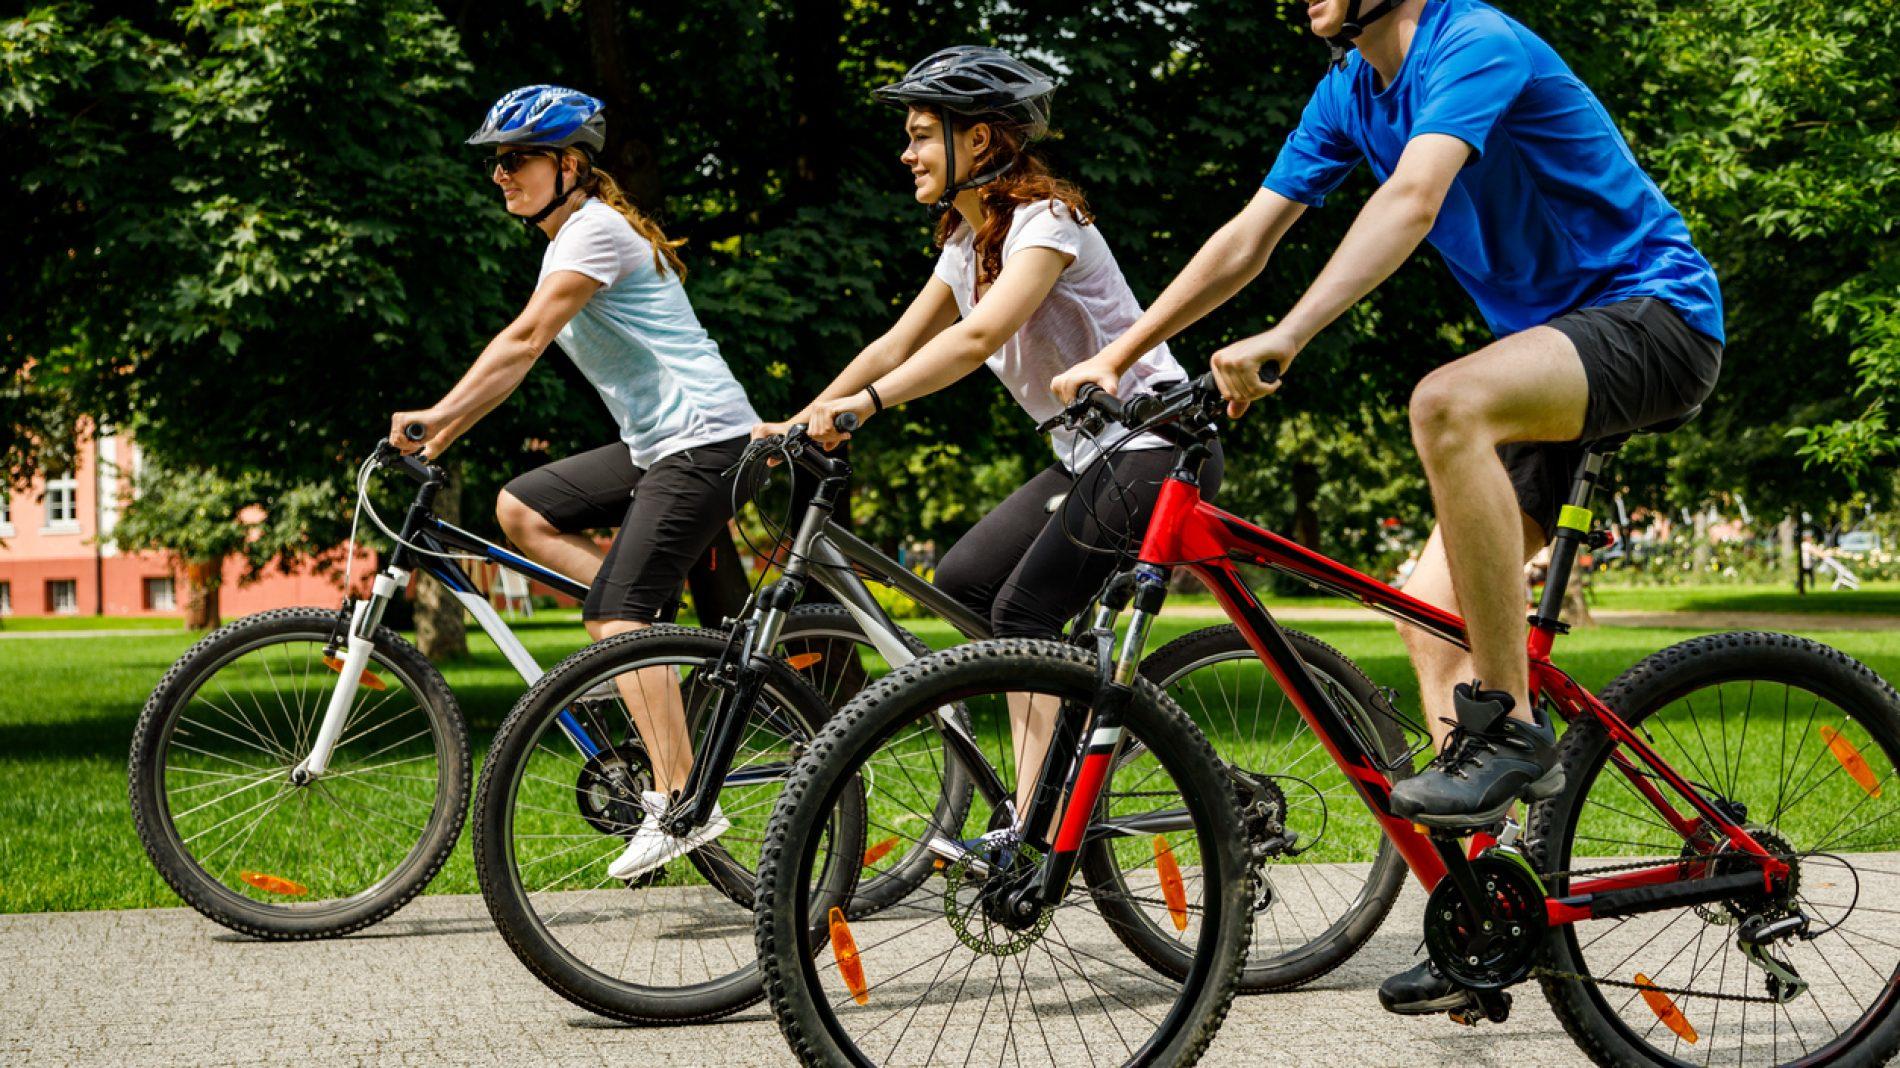 Urban biking- three people riding bikes in city